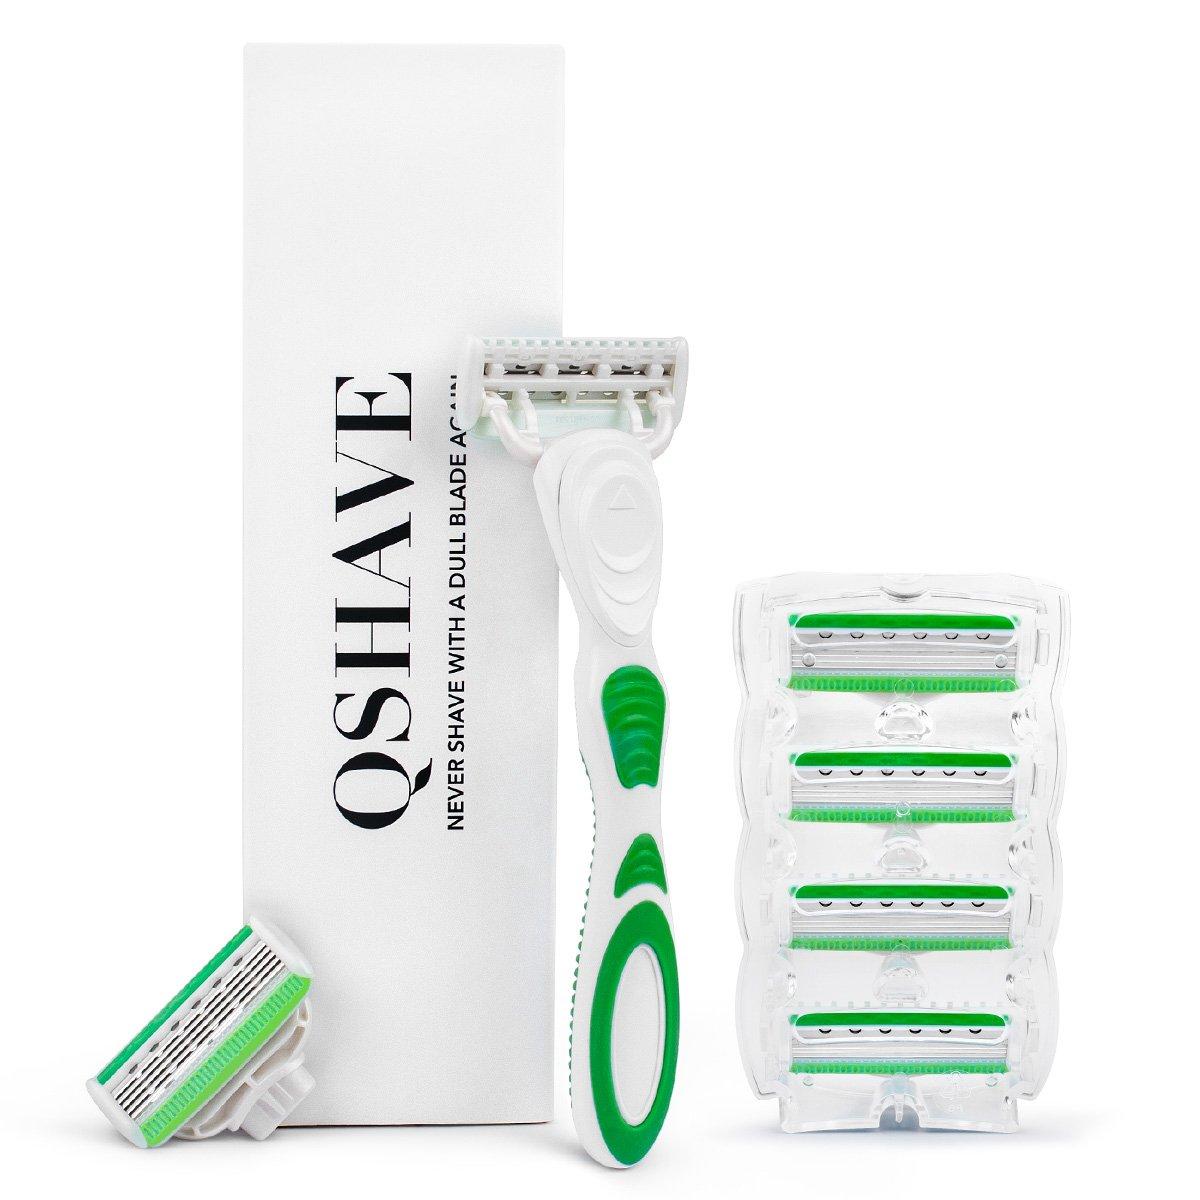 QSHAVE Green Series Women's Shaving Razor with X5 Blade (5-Blade) Replacement Cartridges/Refills (1 Razor + 6 Cartridges)